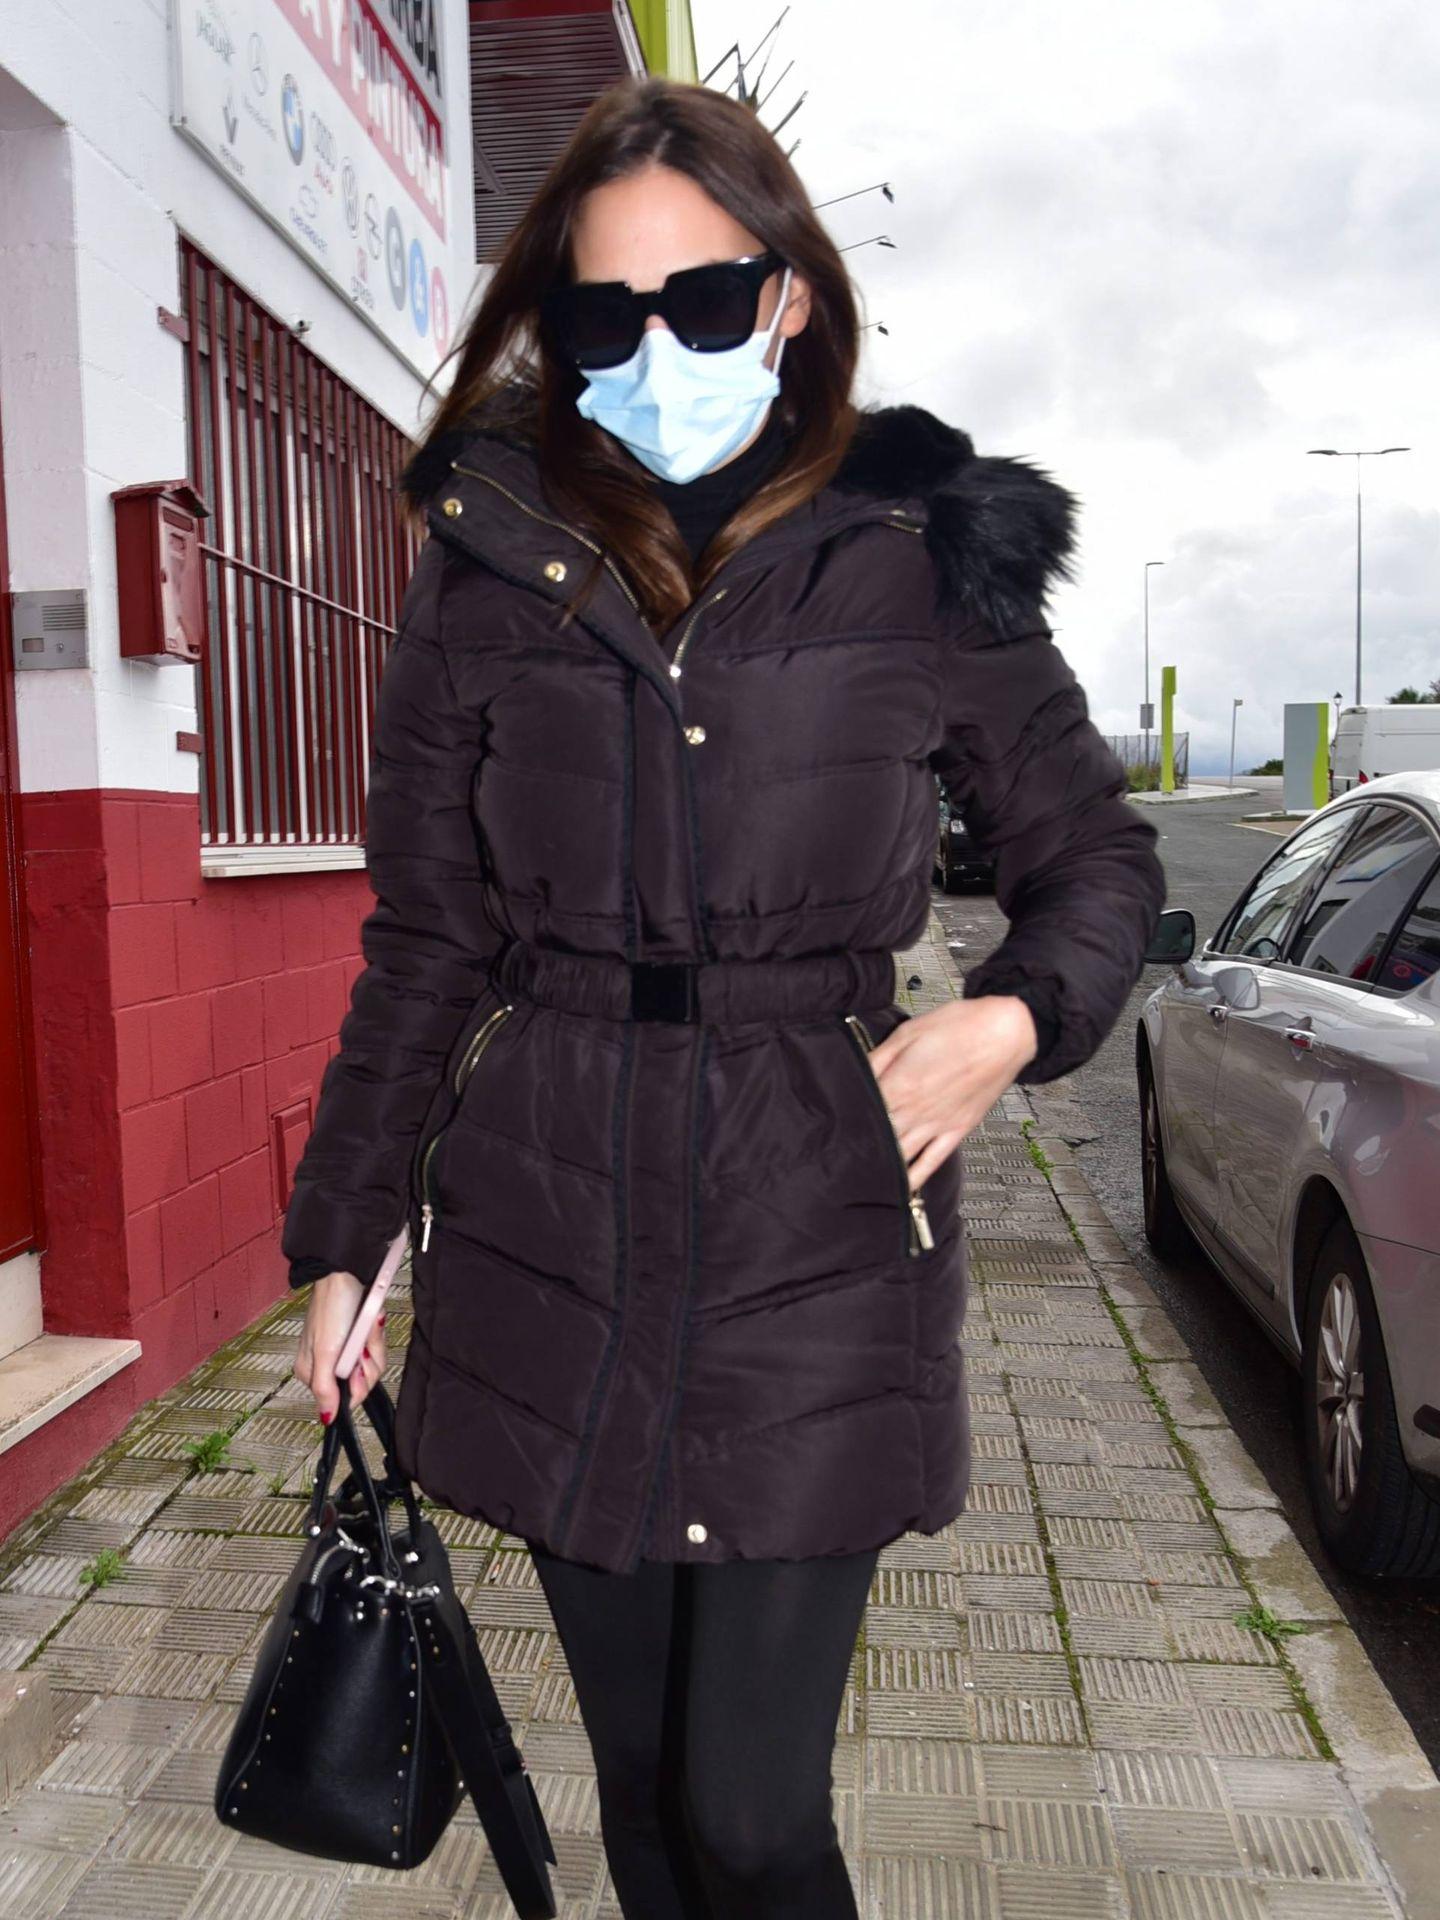 Irene Rosales llega al tanatorio. (Cordon Press)